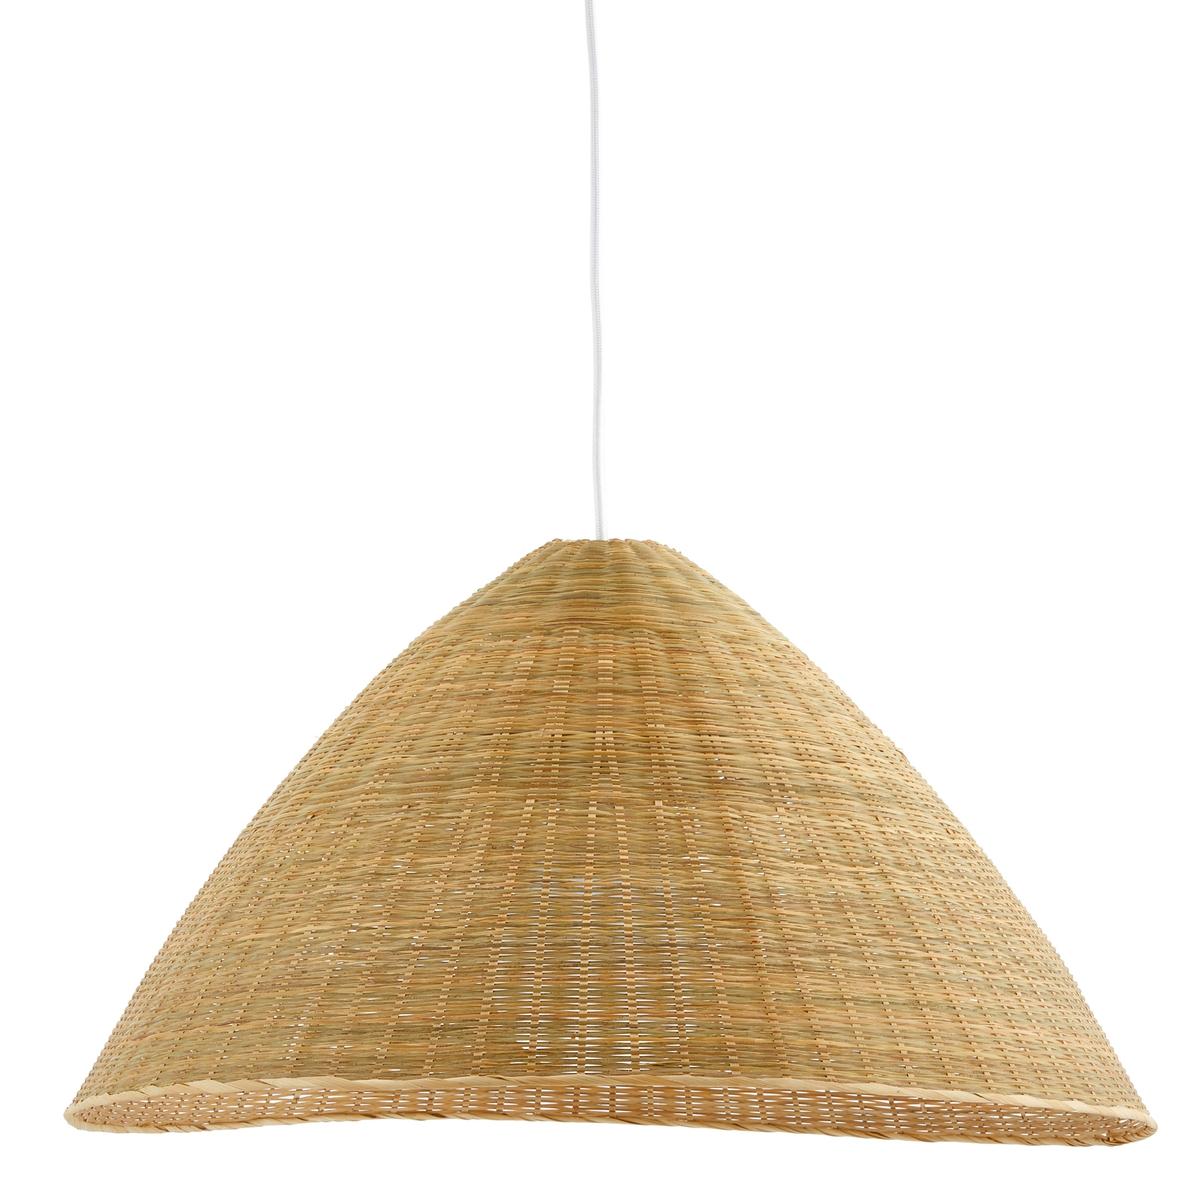 Lampadario artigianale in bambù intrecciato, Nicina